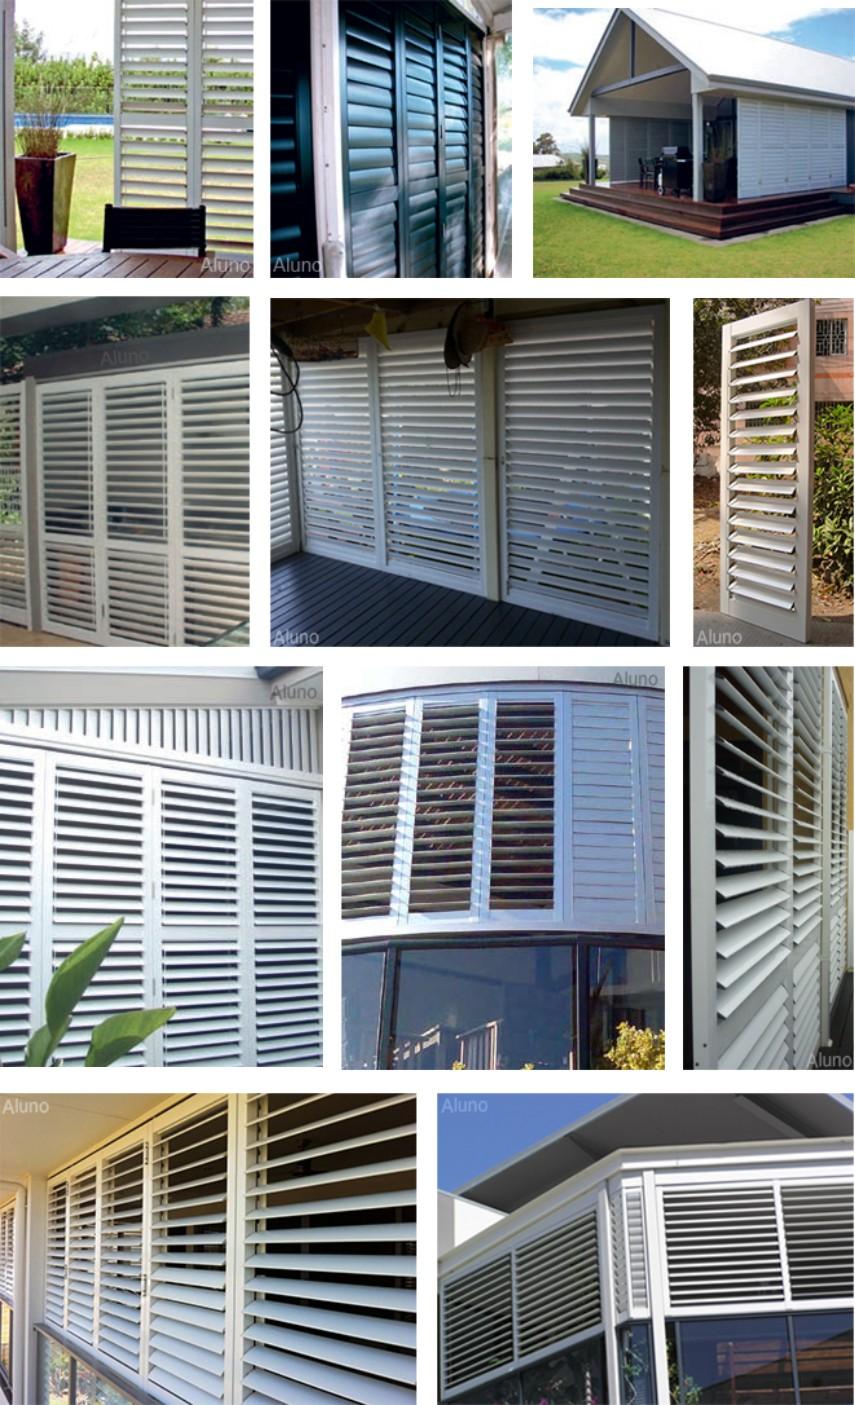 Exterior Bi Folding Aluminium Louvered Shutters Buy Louver Shutter Adjustable Shutters